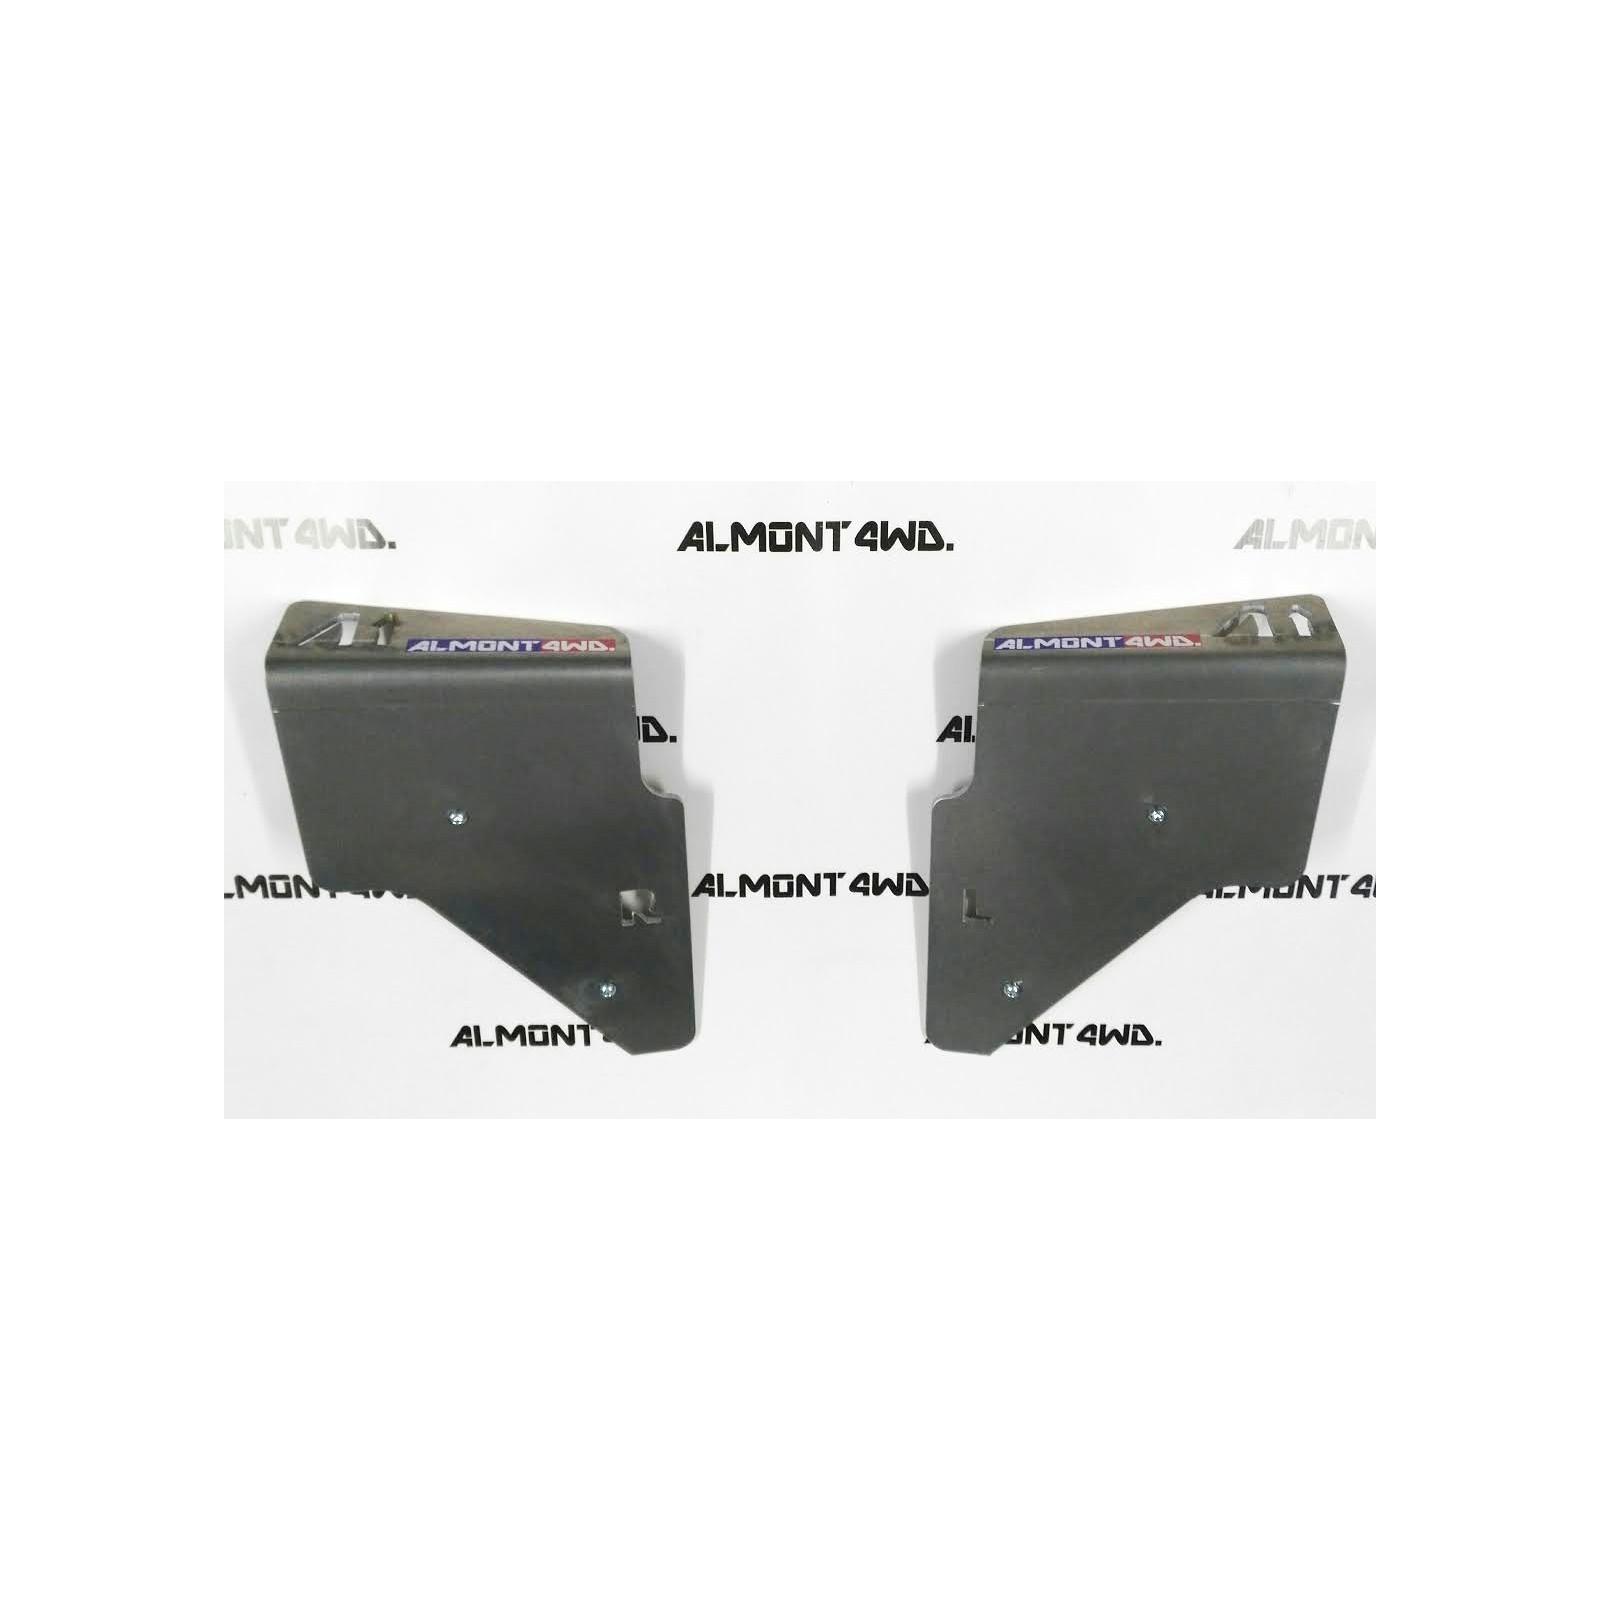 PROTECTORES SUSPENSIÓN DELANTERA DURALUMINIO 6mm ALMONT4WD LAND ROVER DISCOVERY III